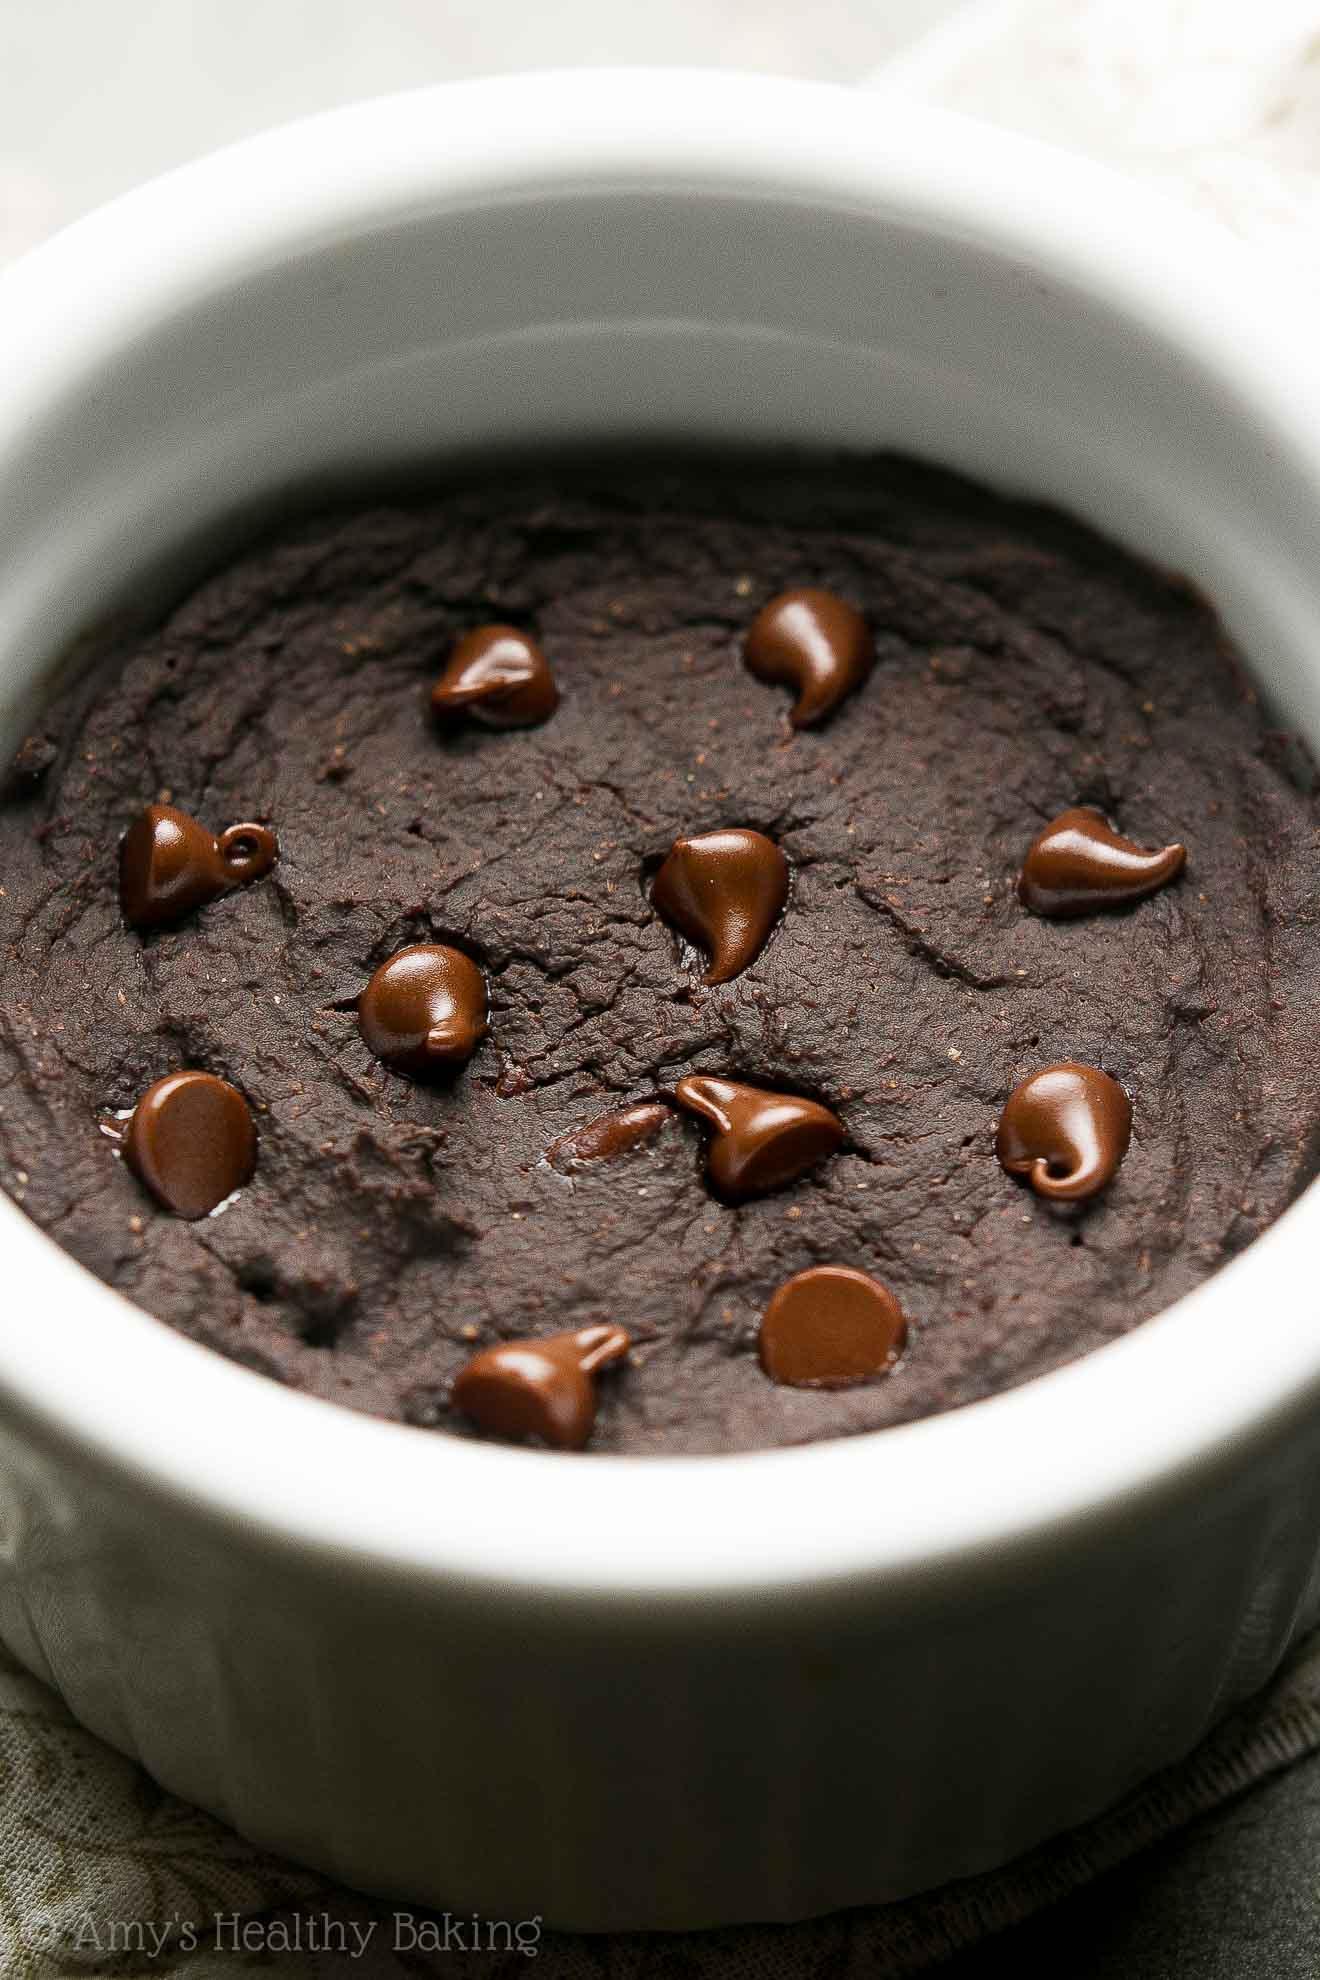 How To Make Mug Cake Using Mocha Powder